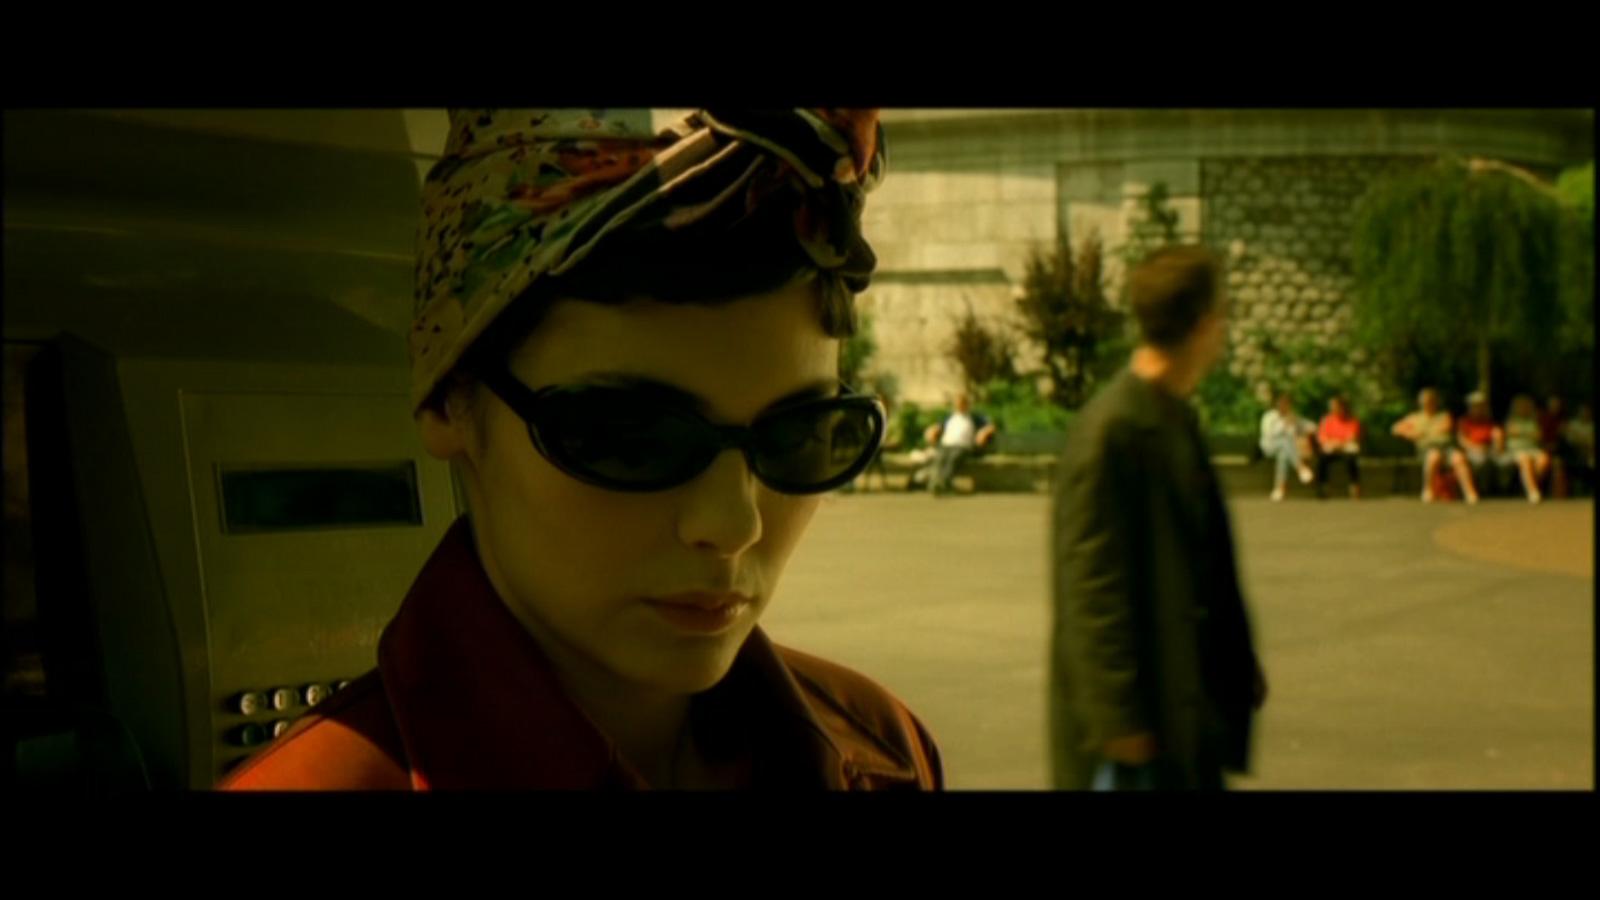 http://3.bp.blogspot.com/-6O9kPWJ58s8/TqleR6ezoPI/AAAAAAAABSc/DEP35-9kv8E/s1600/Amelie-Audrey-Tautou-headscarf.jpg